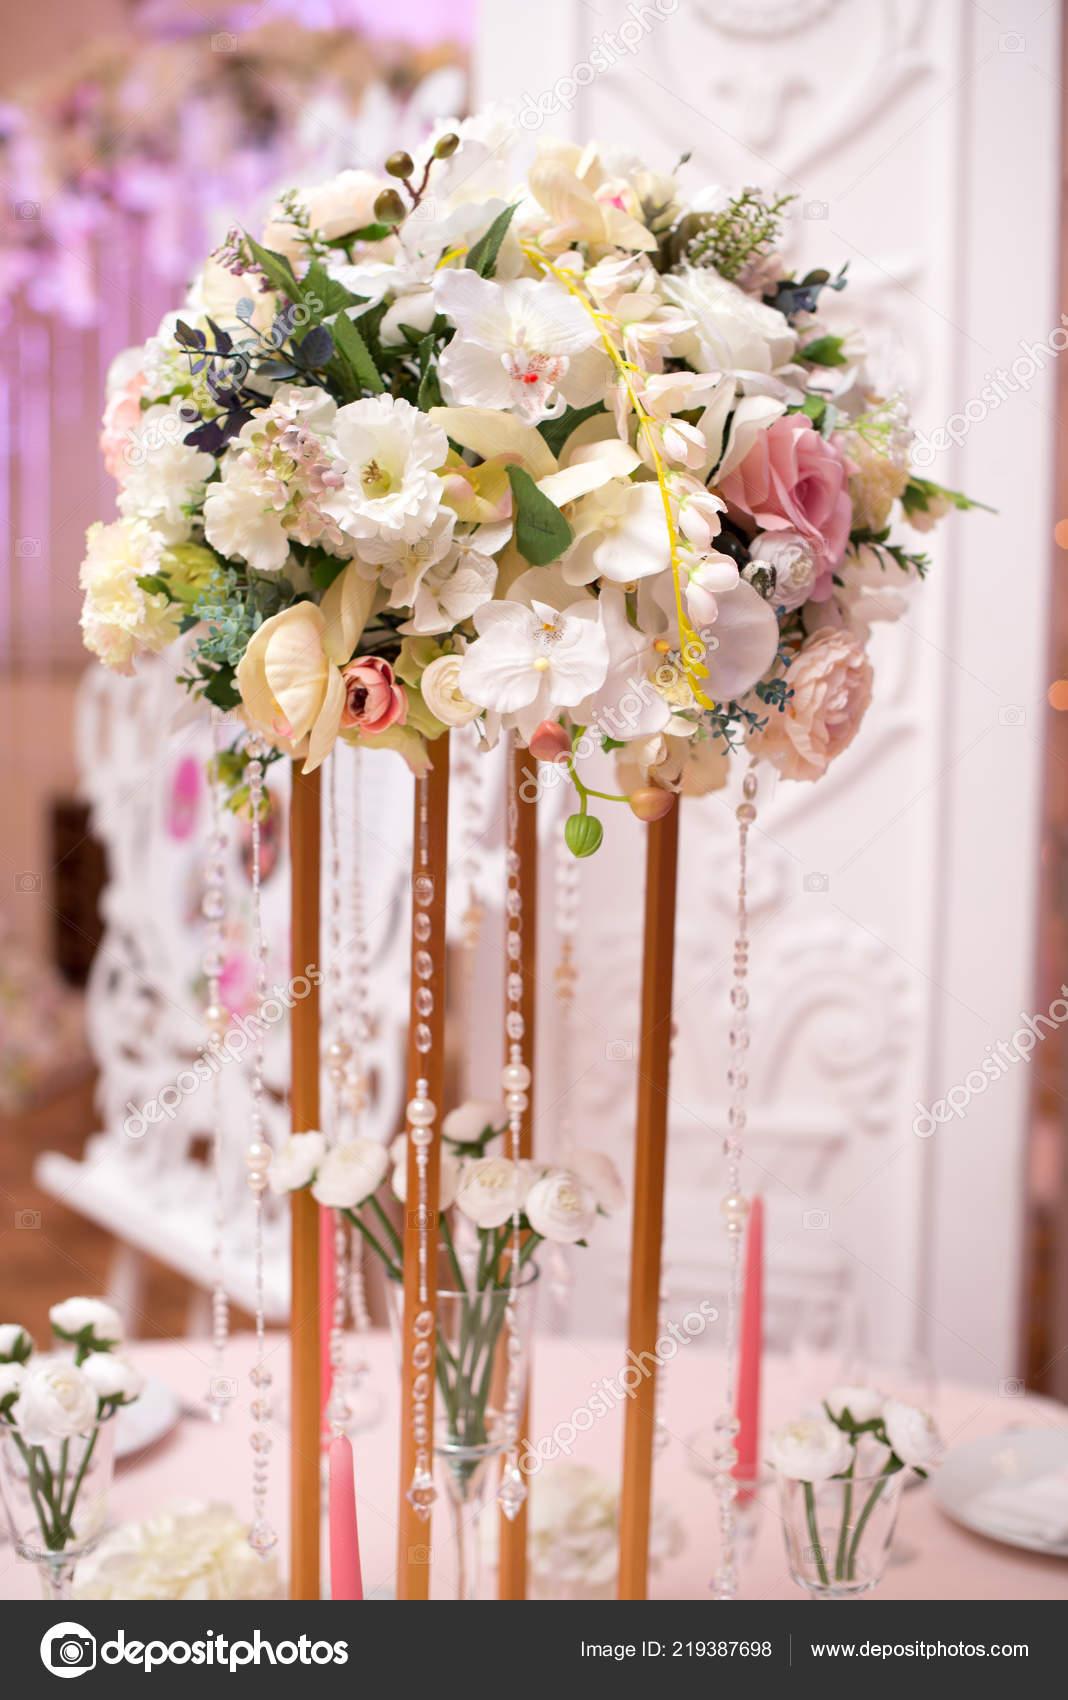 02f69292bf68 Επιτραπέζιες Διακοσμήσεις Λουλουδιών Για Διακοπές Και Δείπνο Του Γάμου  Πίνακα– εικόνα αρχείου